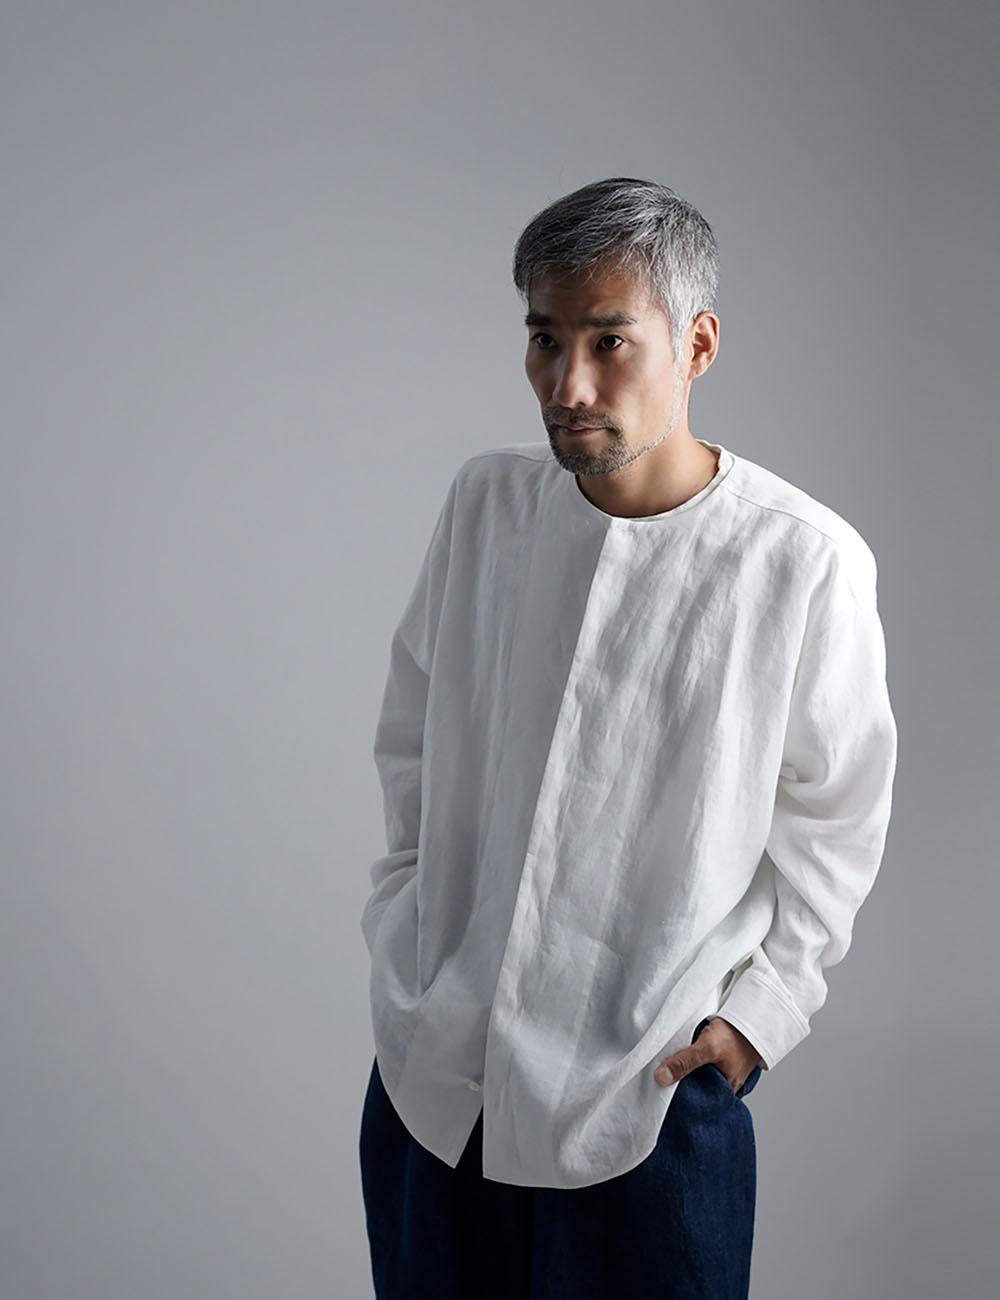 【wafu】Oversized Linen shirt 比翼ビックシャツ 男女兼用 / 白色 t021e-wht1